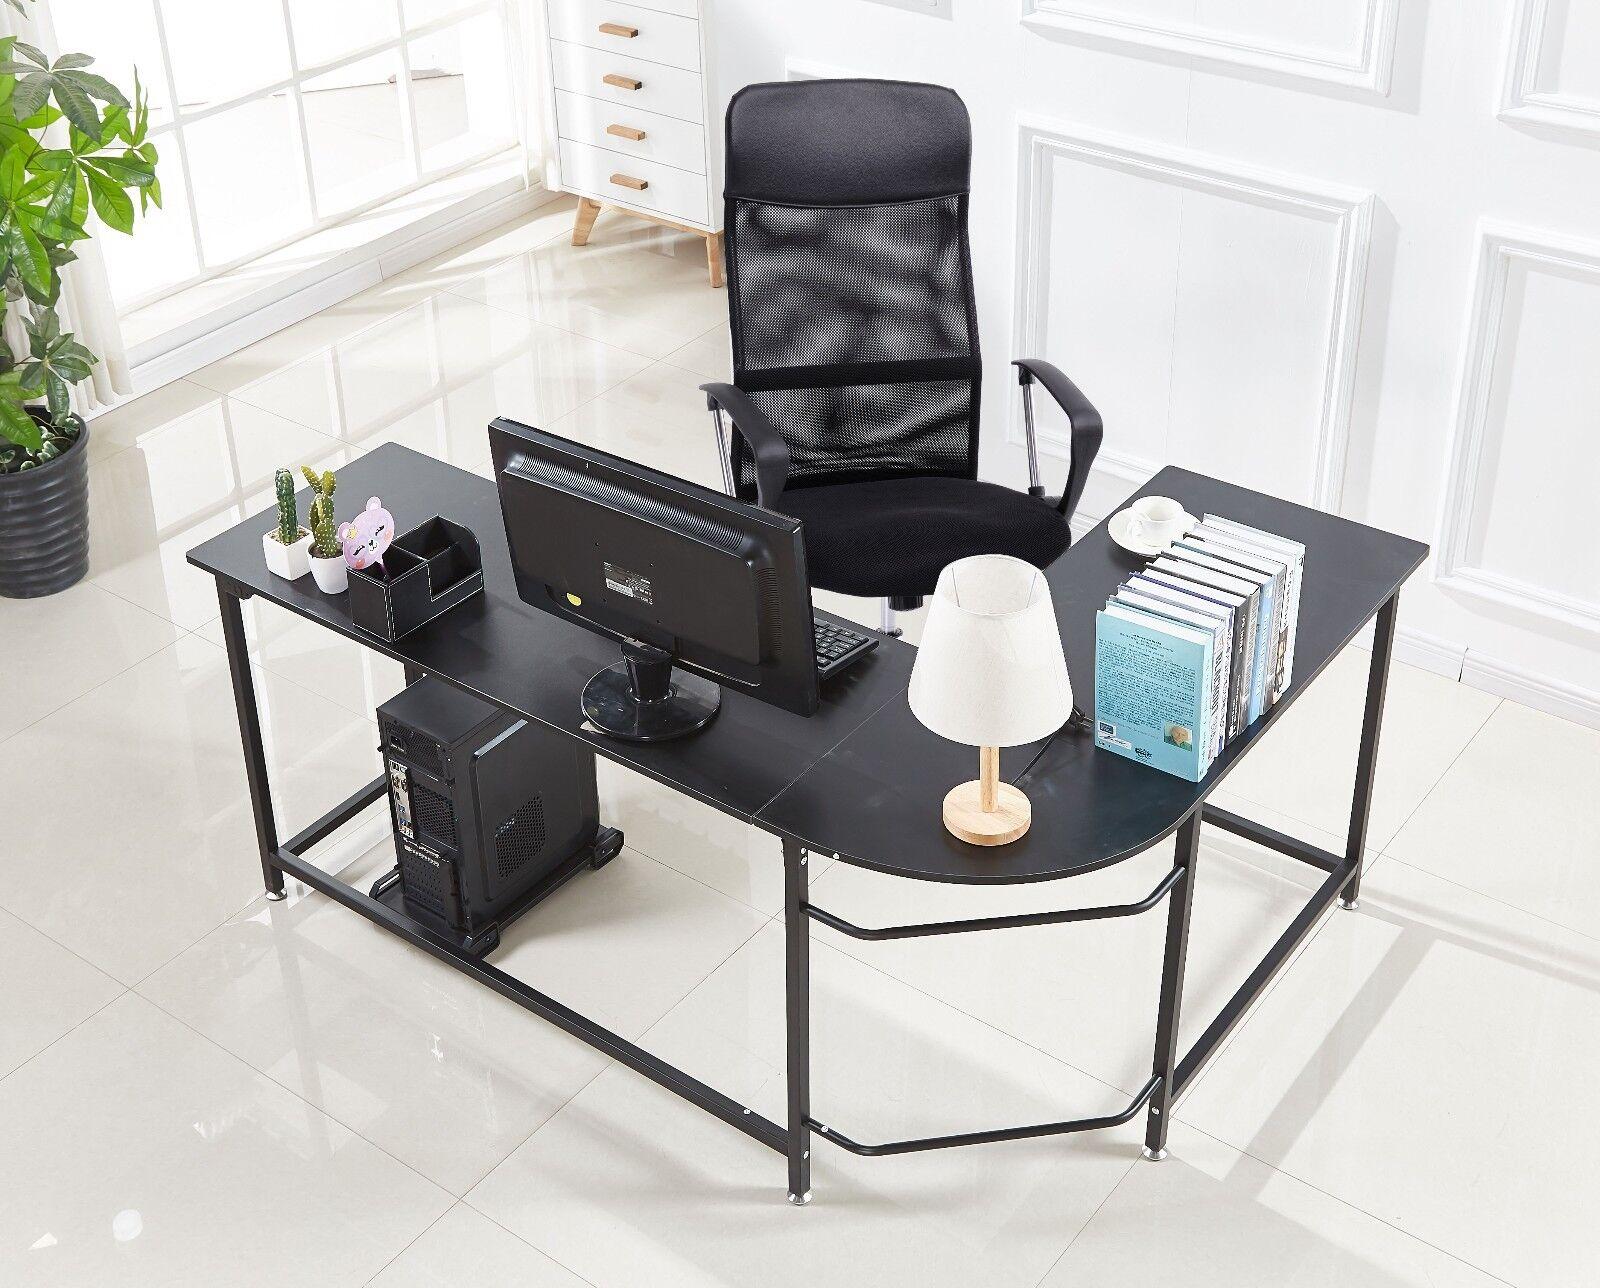 Marvelous Details About L Shaped Corner Desk Computer Gaming Desk PC Table Home  Office Workstation Small